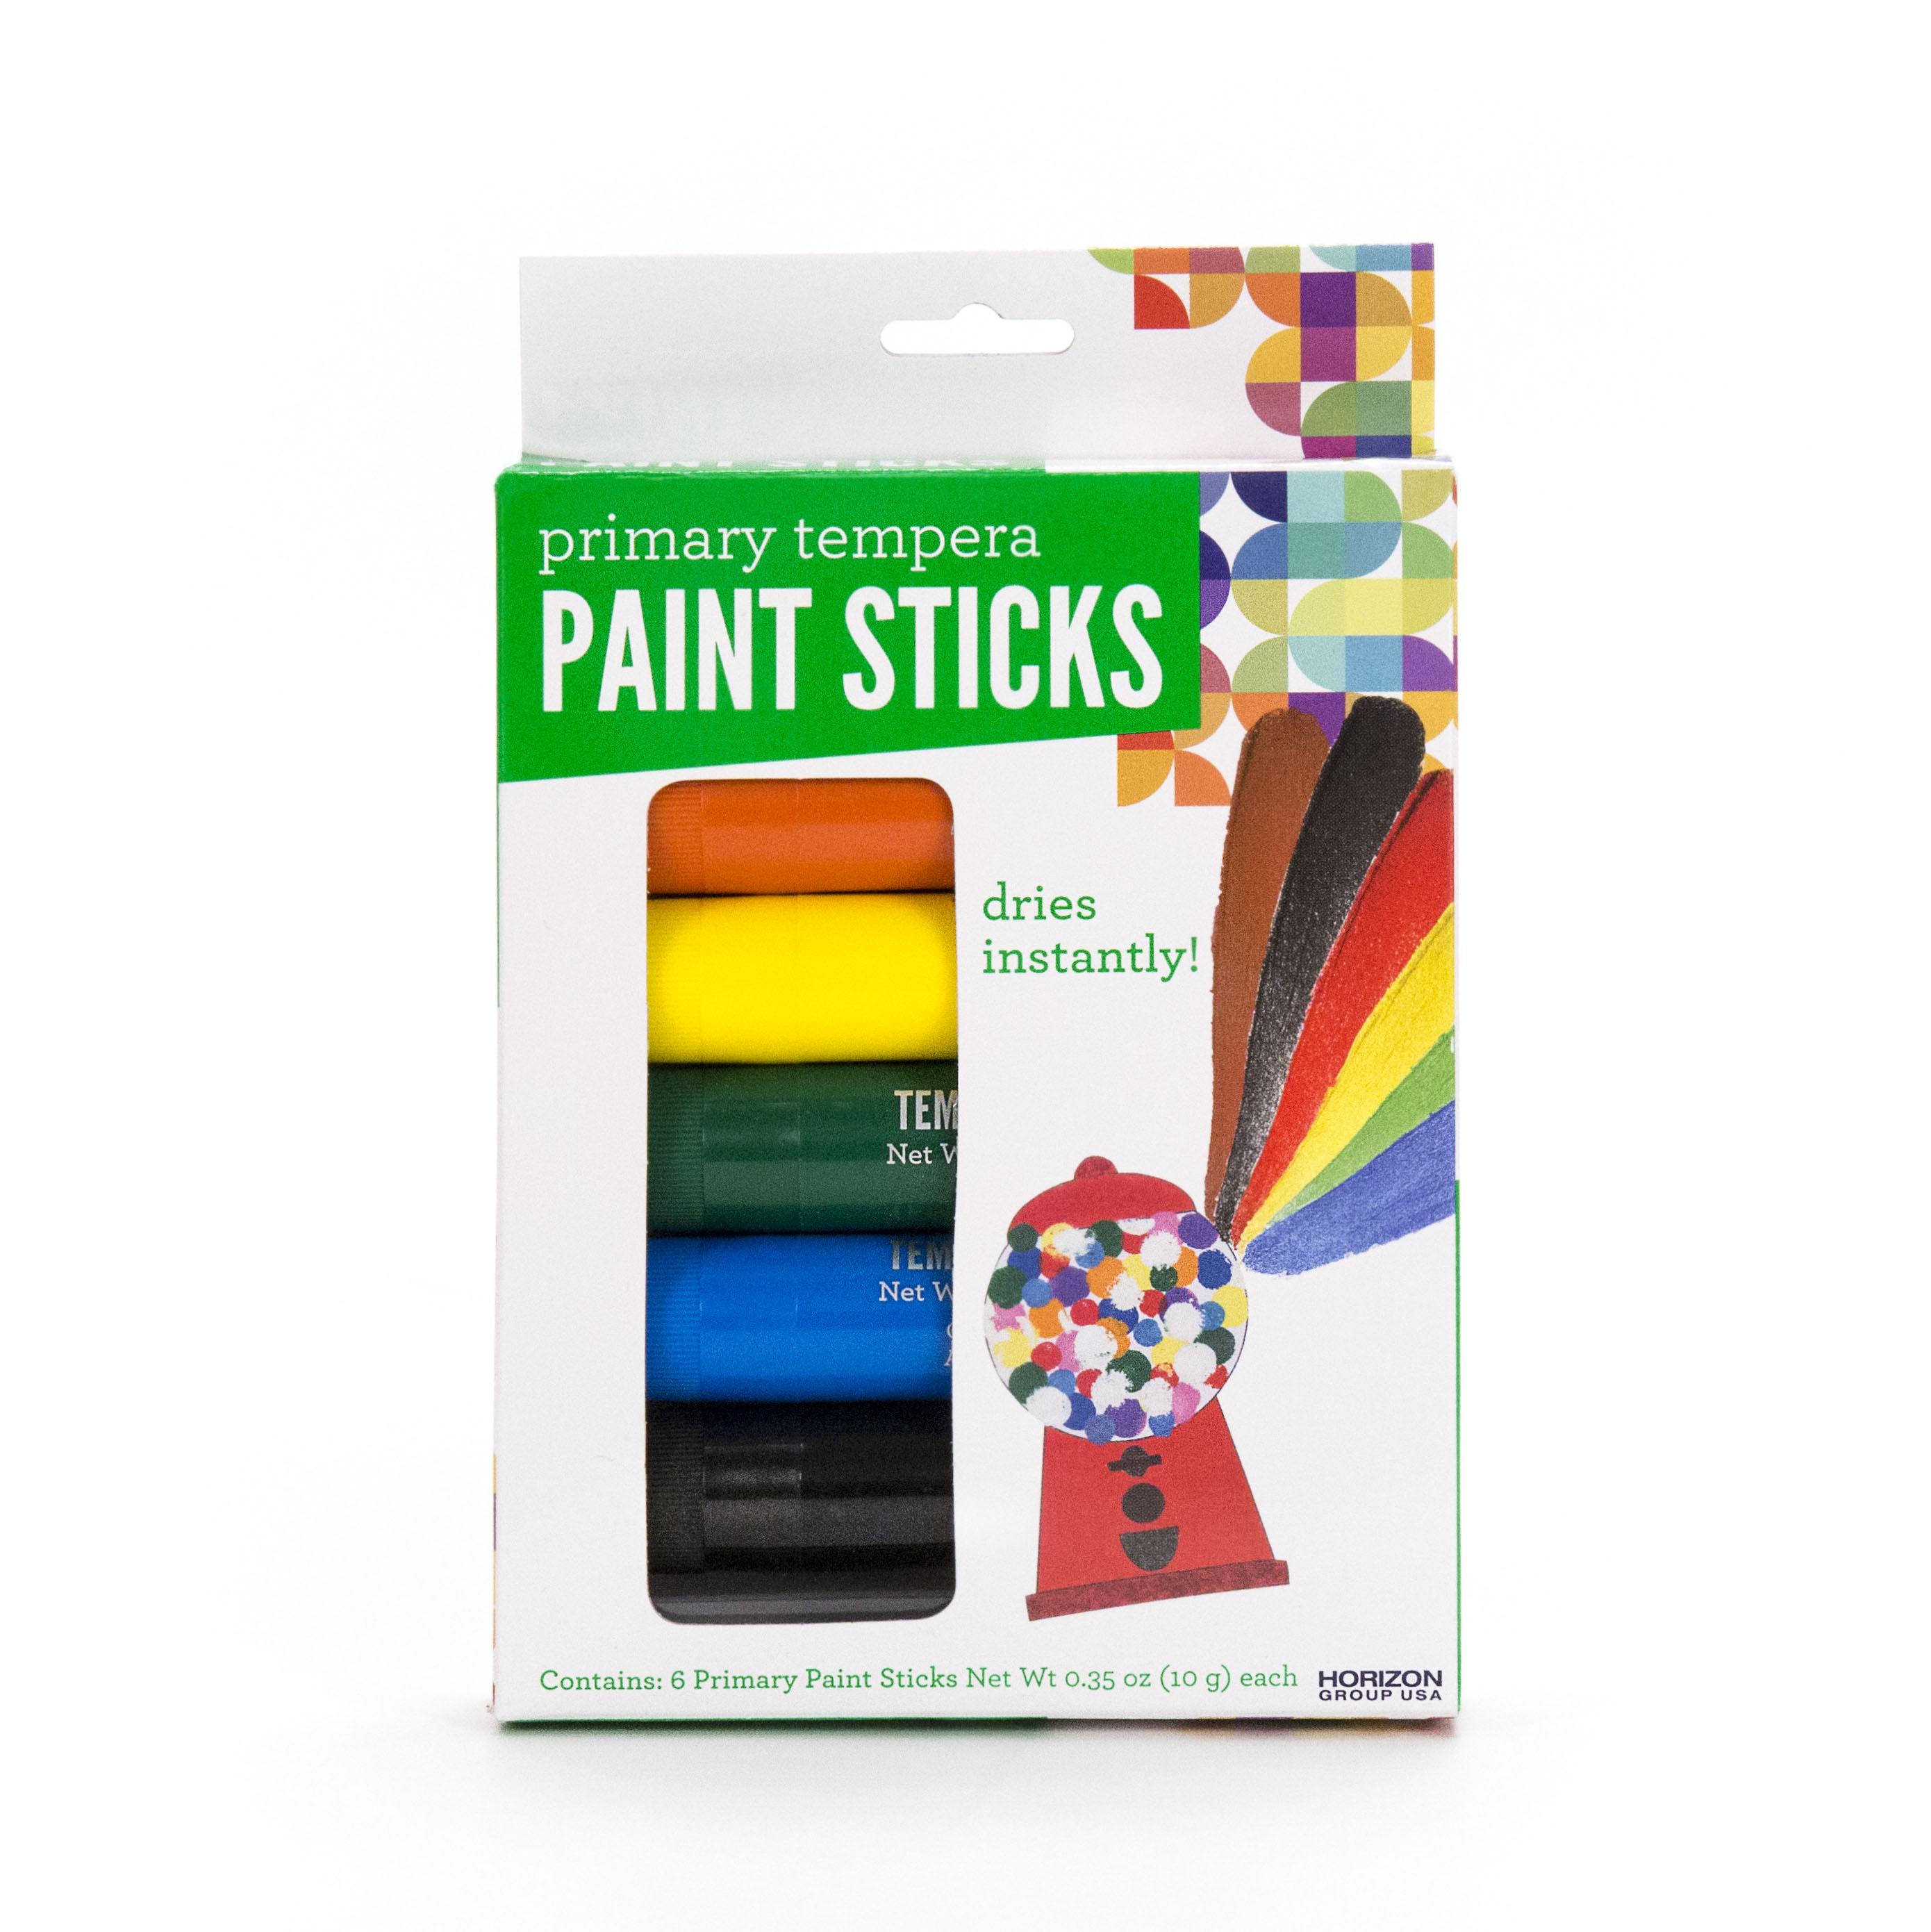 Primary Tempera Paint Sticks by Horizon Group USA